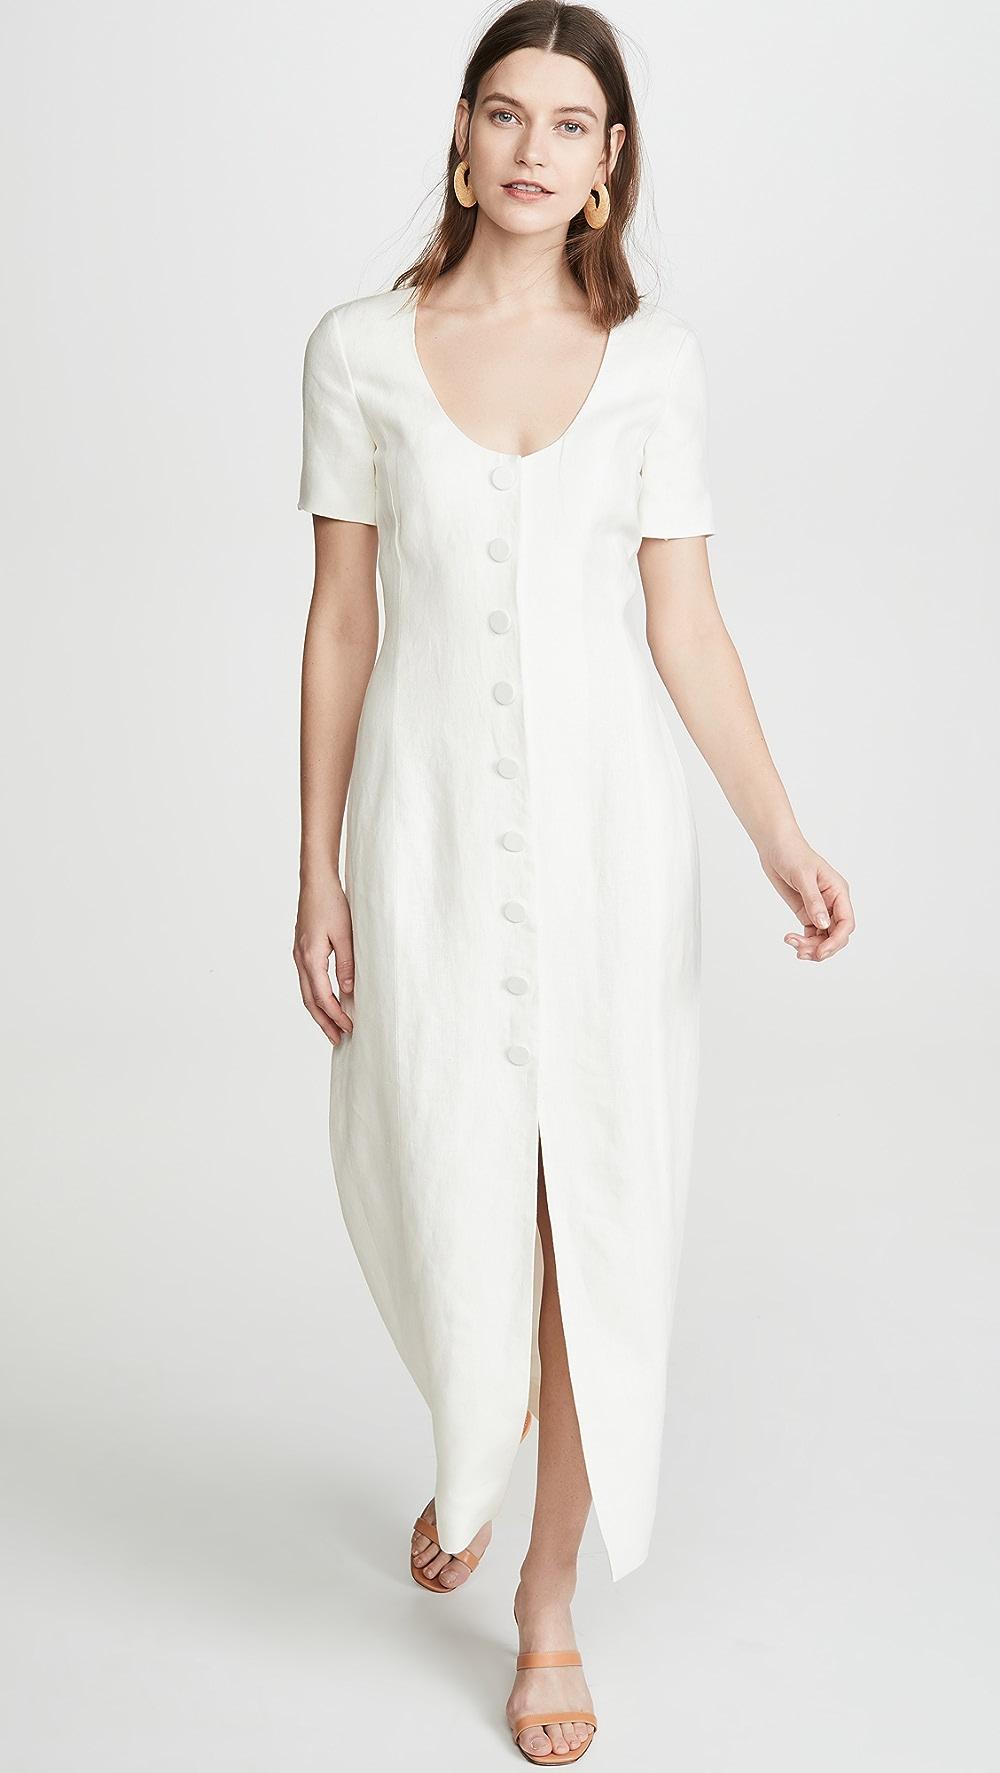 Hospitable Rebecca De Ravenel - Lots Of Love Dress Exquisite Craftsmanship;